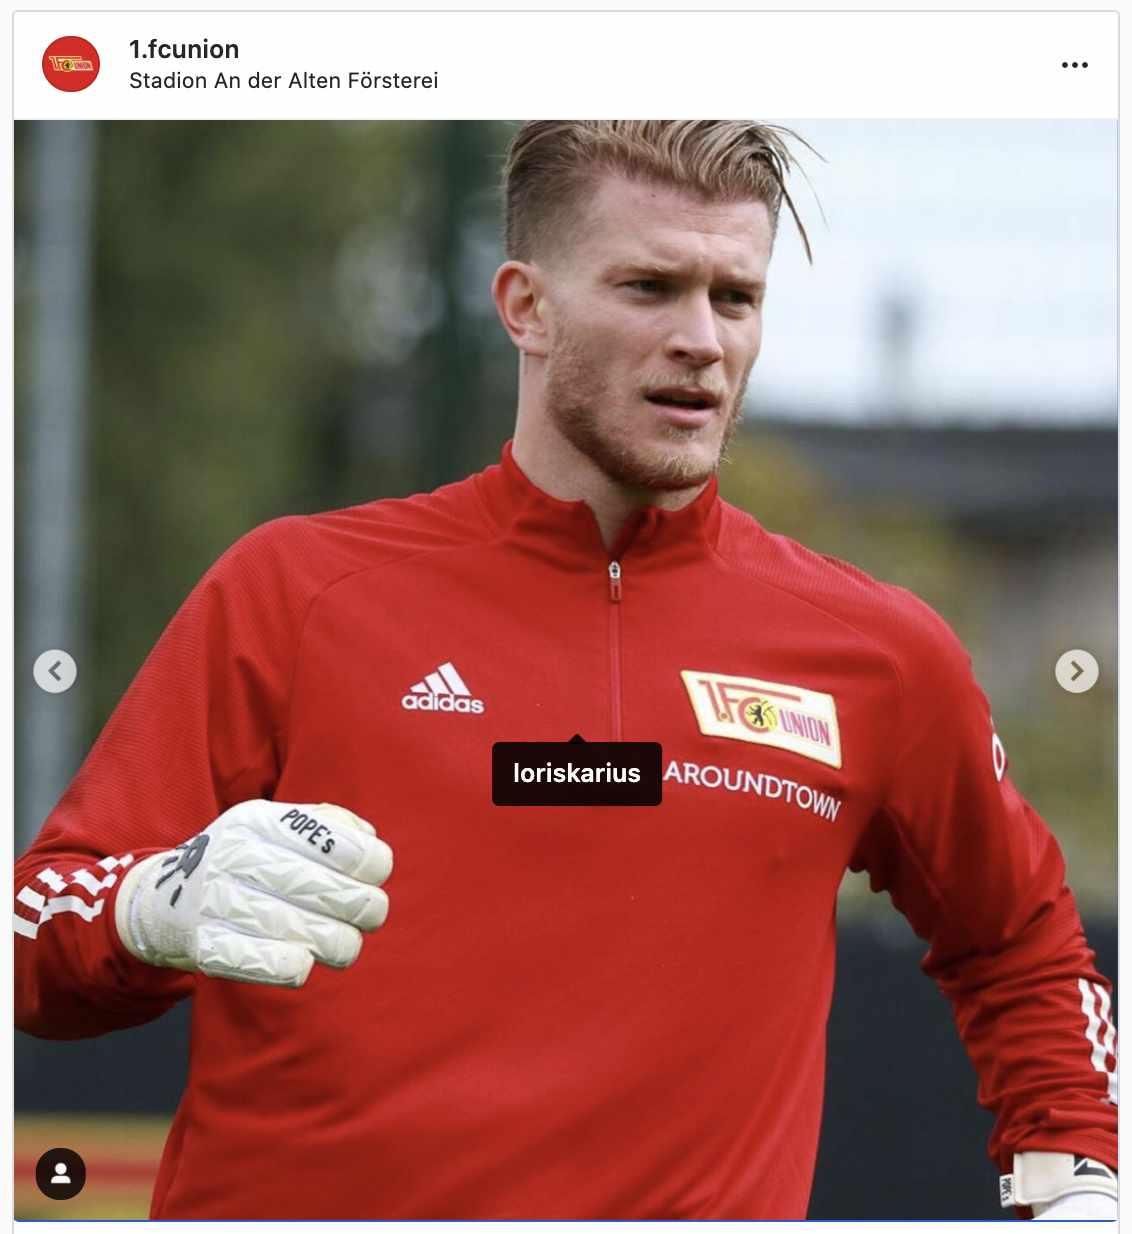 Loris Karius beim Training, Foto: 1. FC Union Berlin Instagram